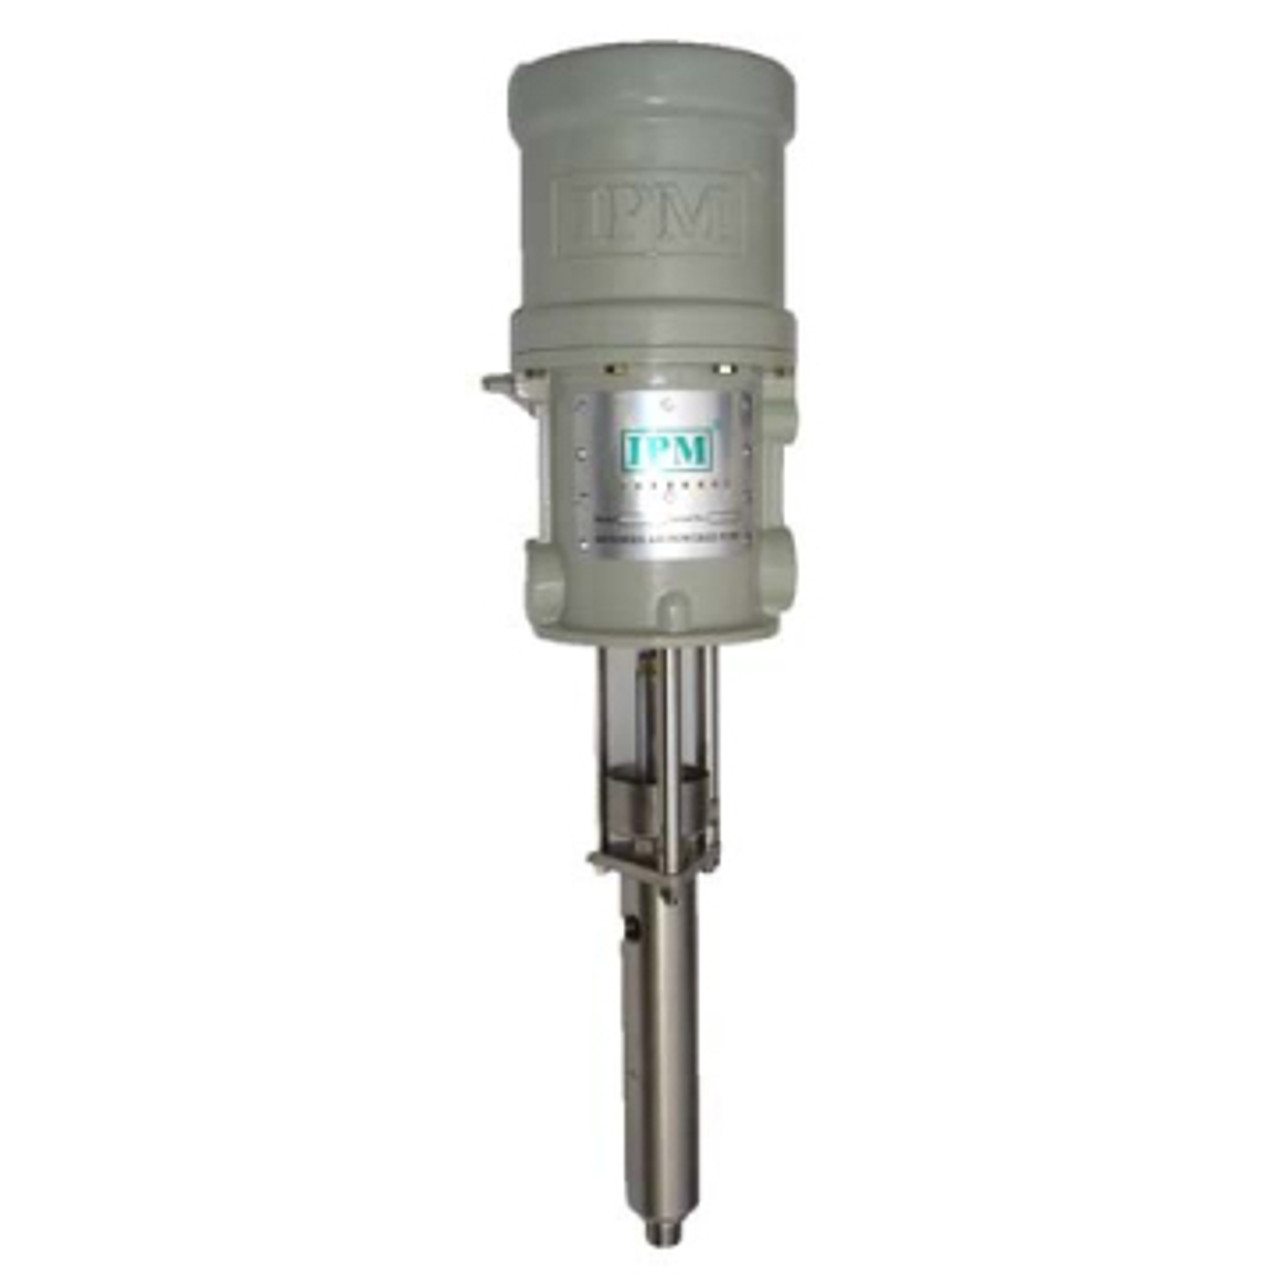 IP-15 Transfer Pump (15:1 Ratio)